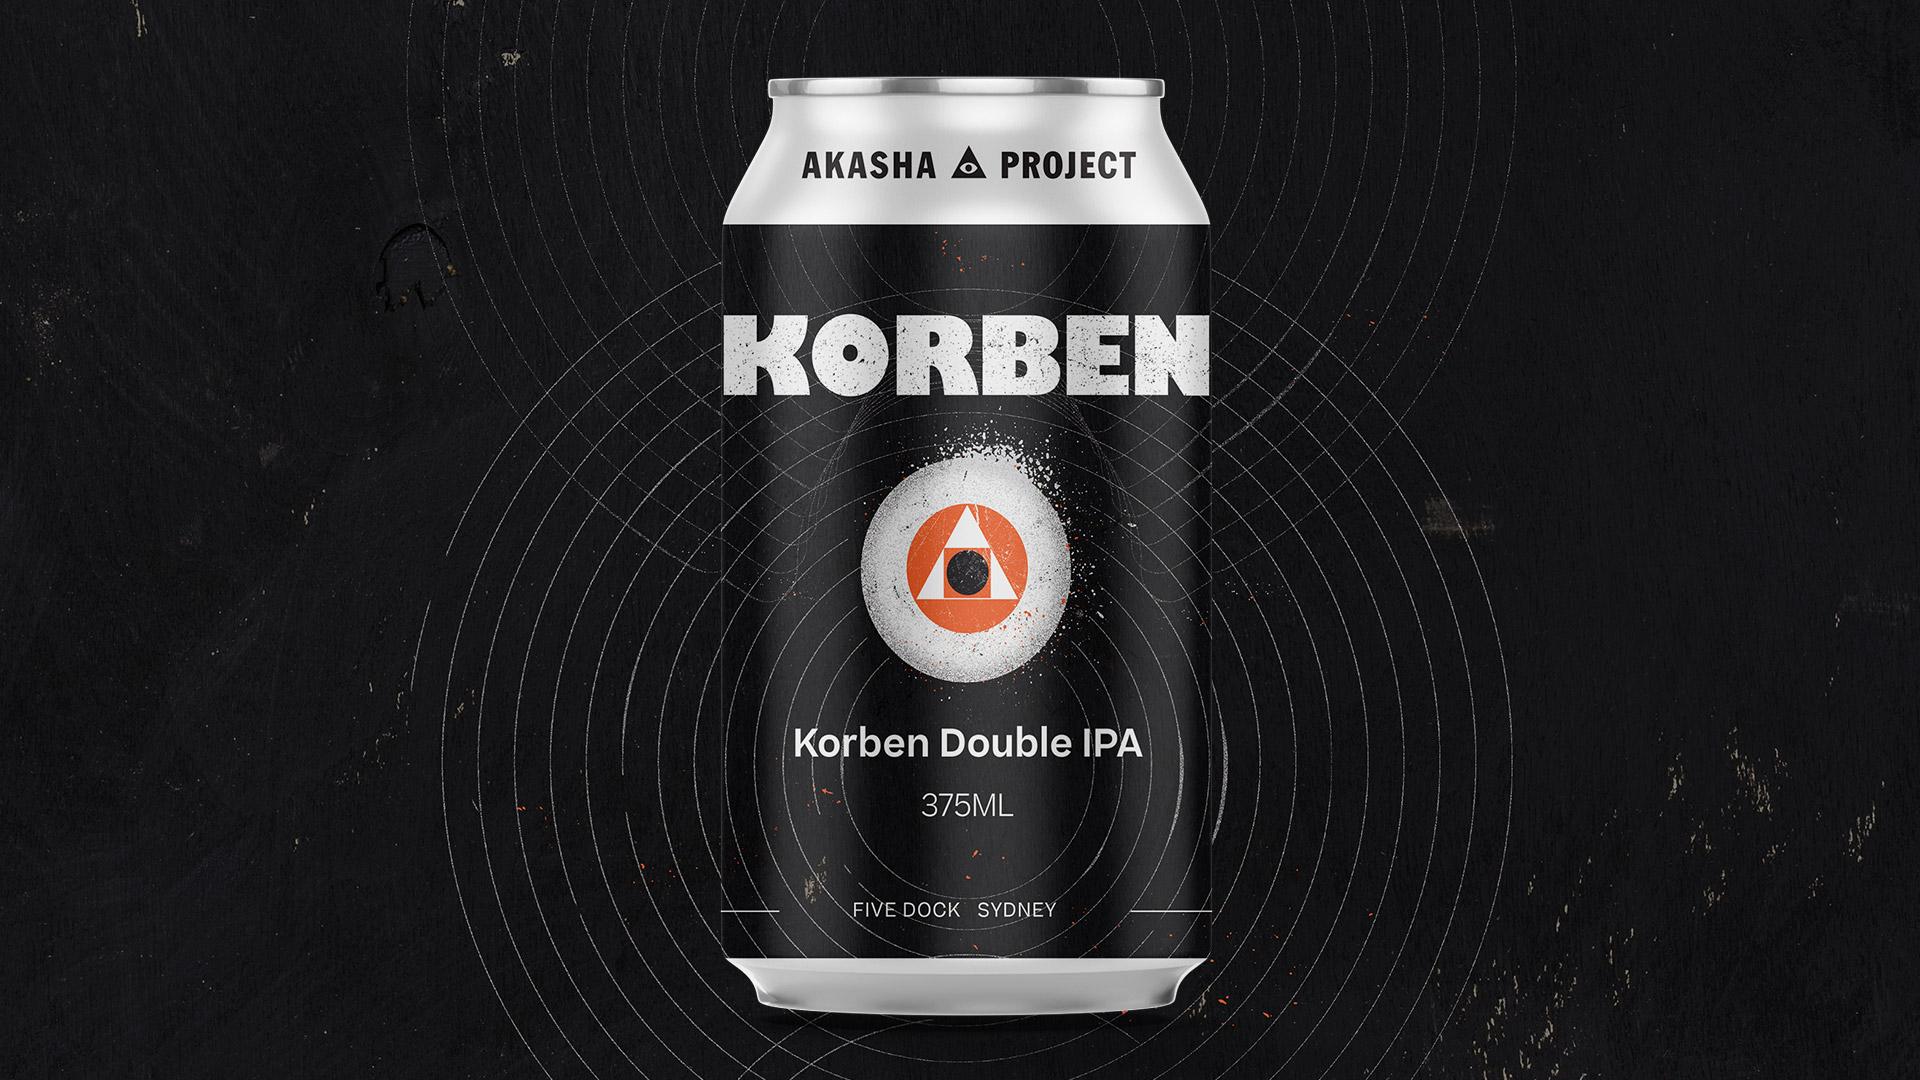 New Release: Korben Double IPA - Akasha Brewing Company